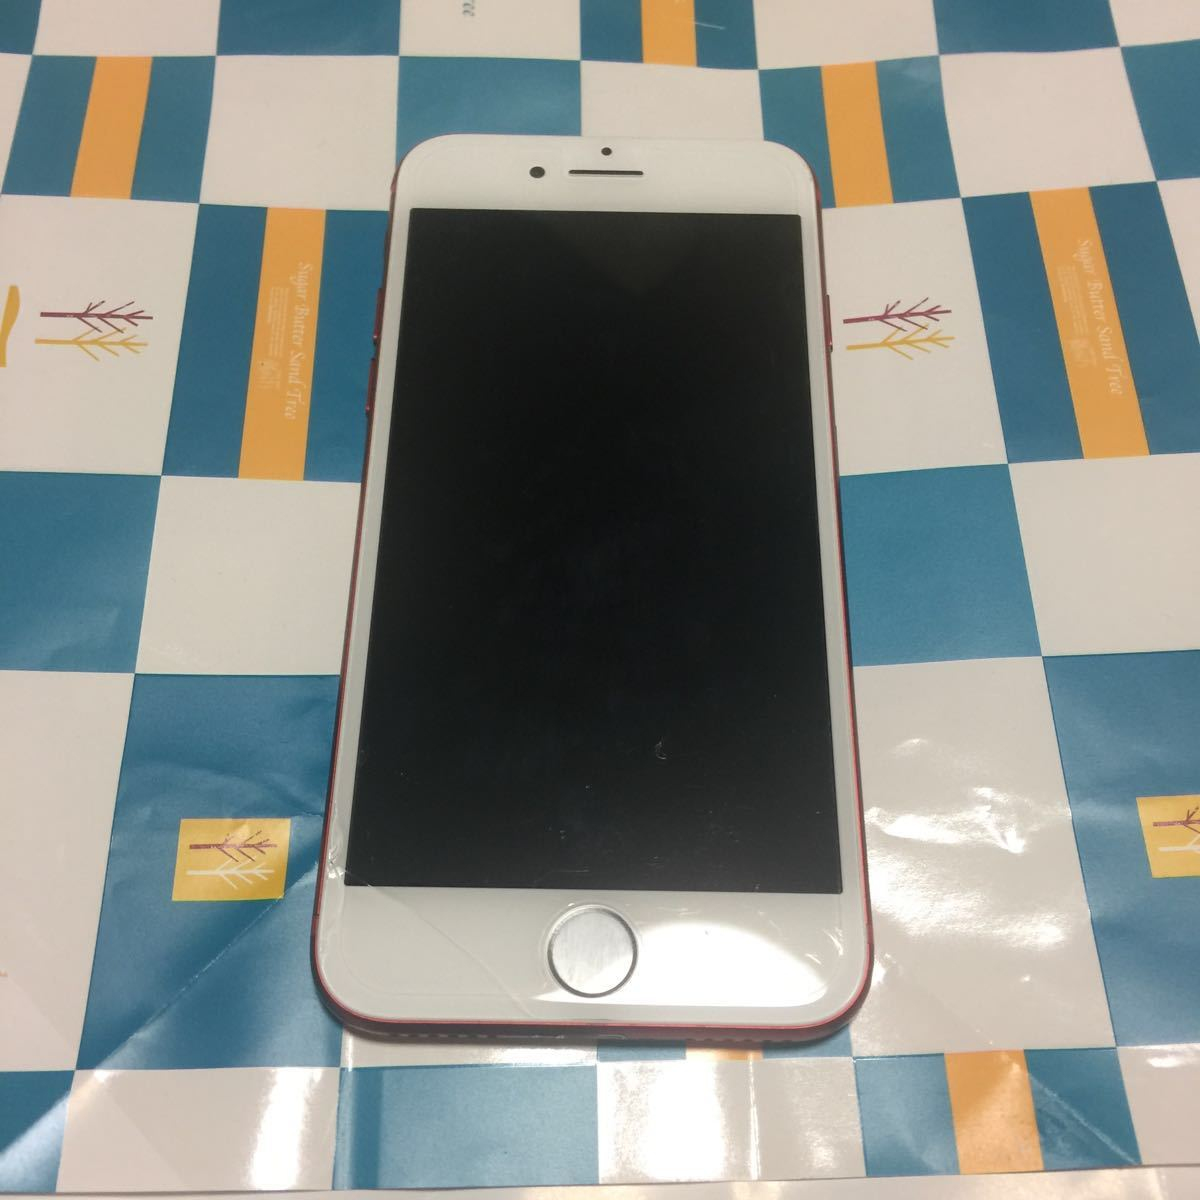 au iPhone 7 128GB (PRODUCT) レッド 本体 携帯 中古 スマホ apple アップル[ ジャンク] 送料無料。 全体 全体的に状態が悪い。